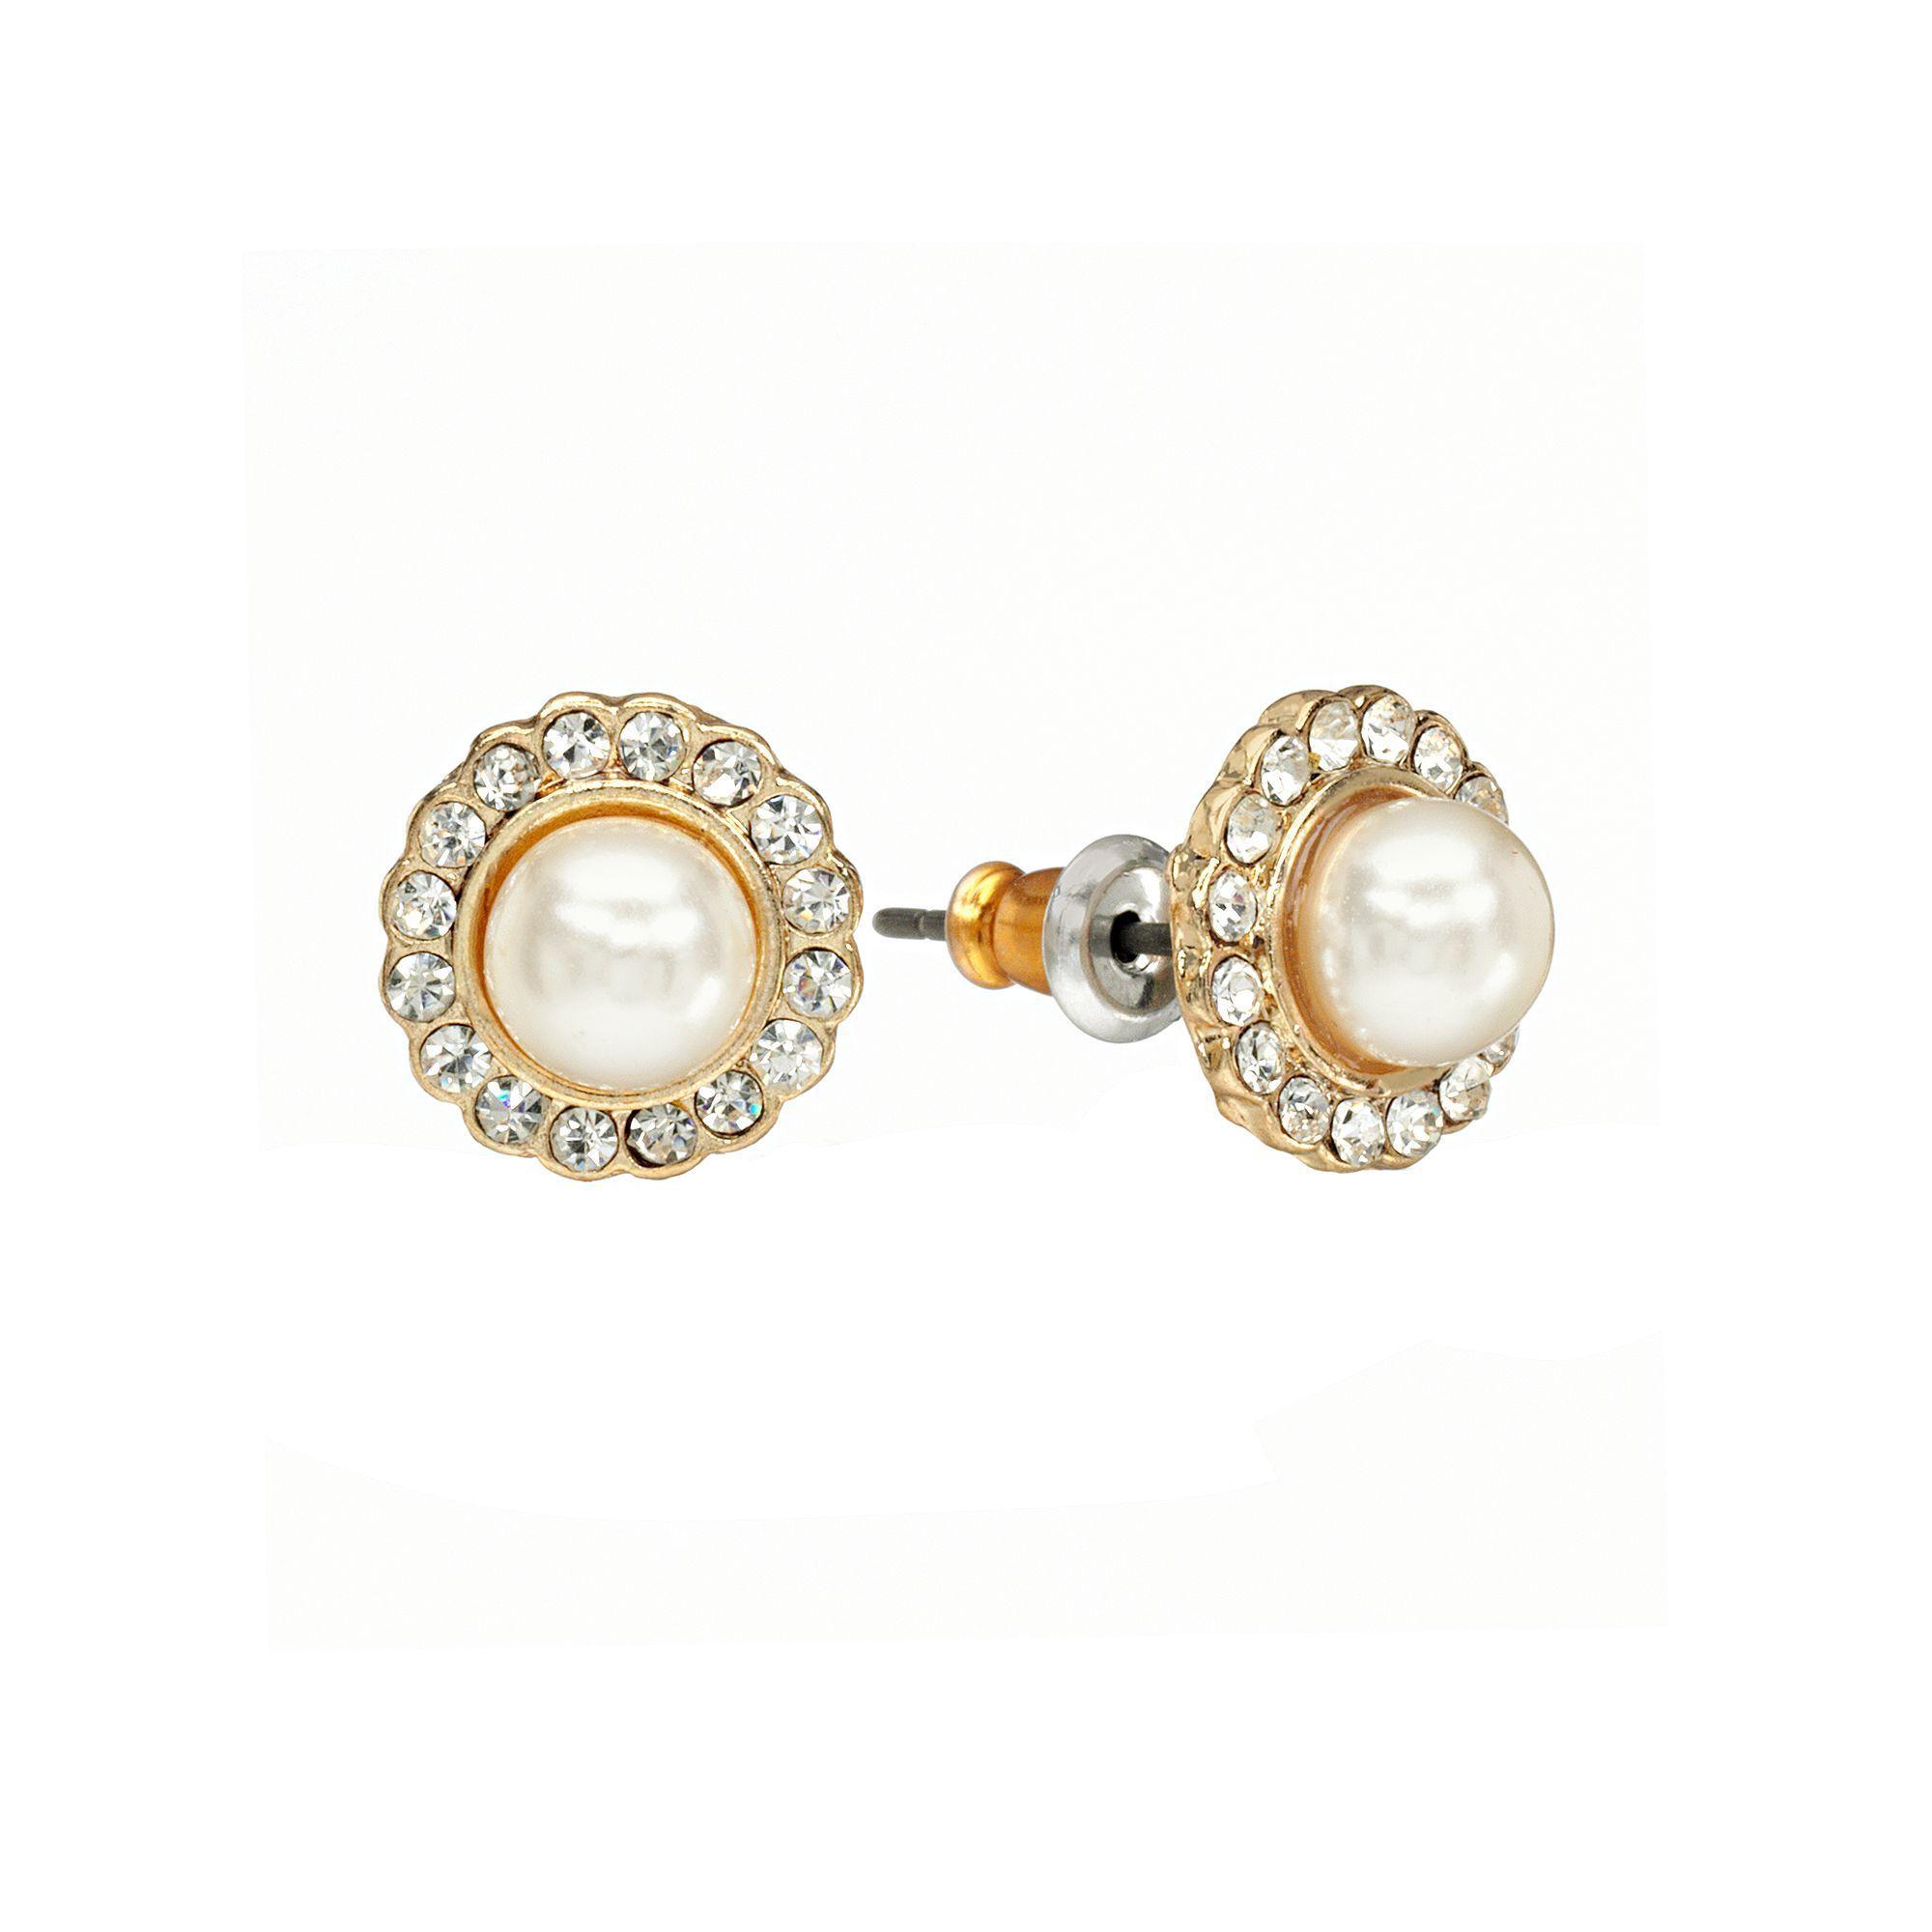 3cfb41231 LC Lauren Conrad Flower Button Stud Earrings, Women's, White